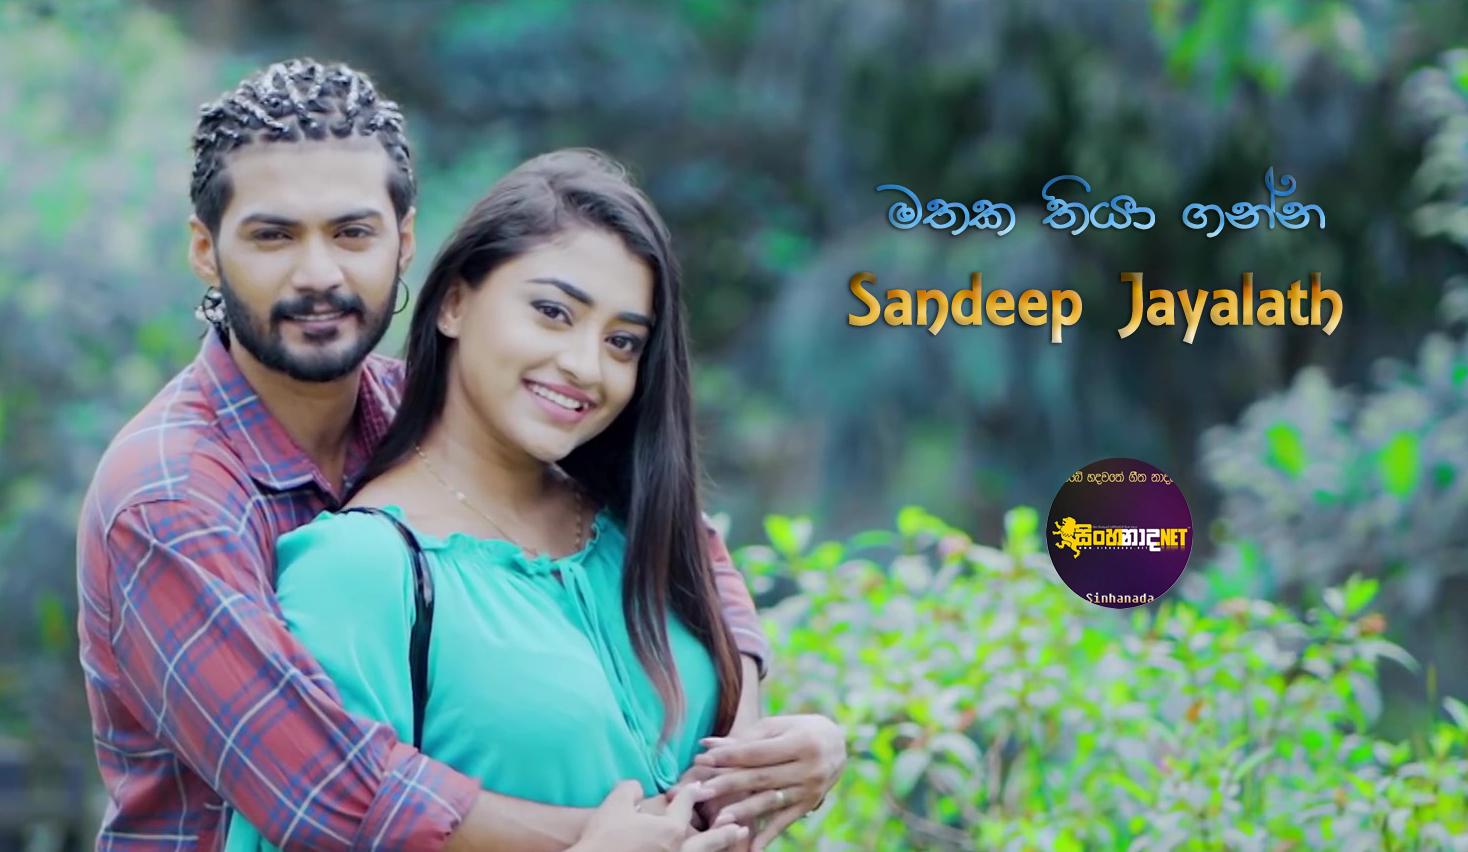 Mathaka Thiyaganna - Sandeep Jayalath  Official Video